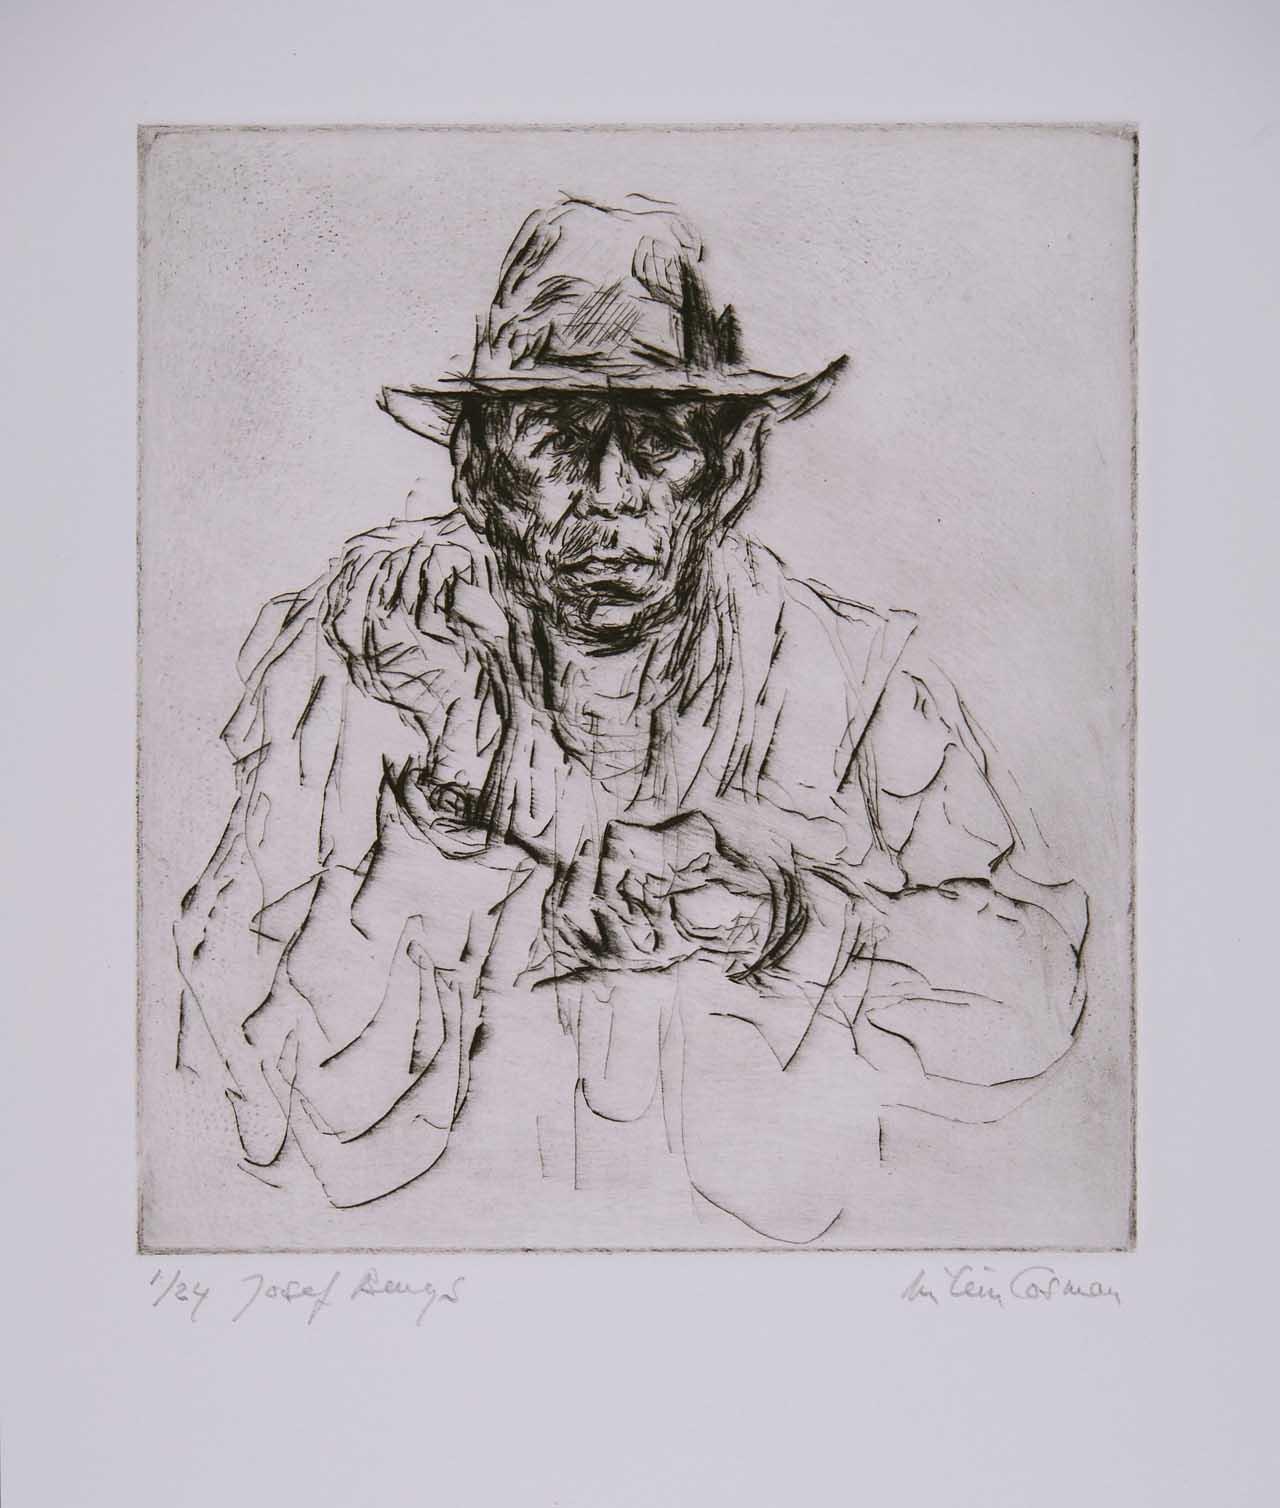 Joseph Beuys, Milein Cosman, 1983 (Foto: The Cosman Keller Art & Music Trust)